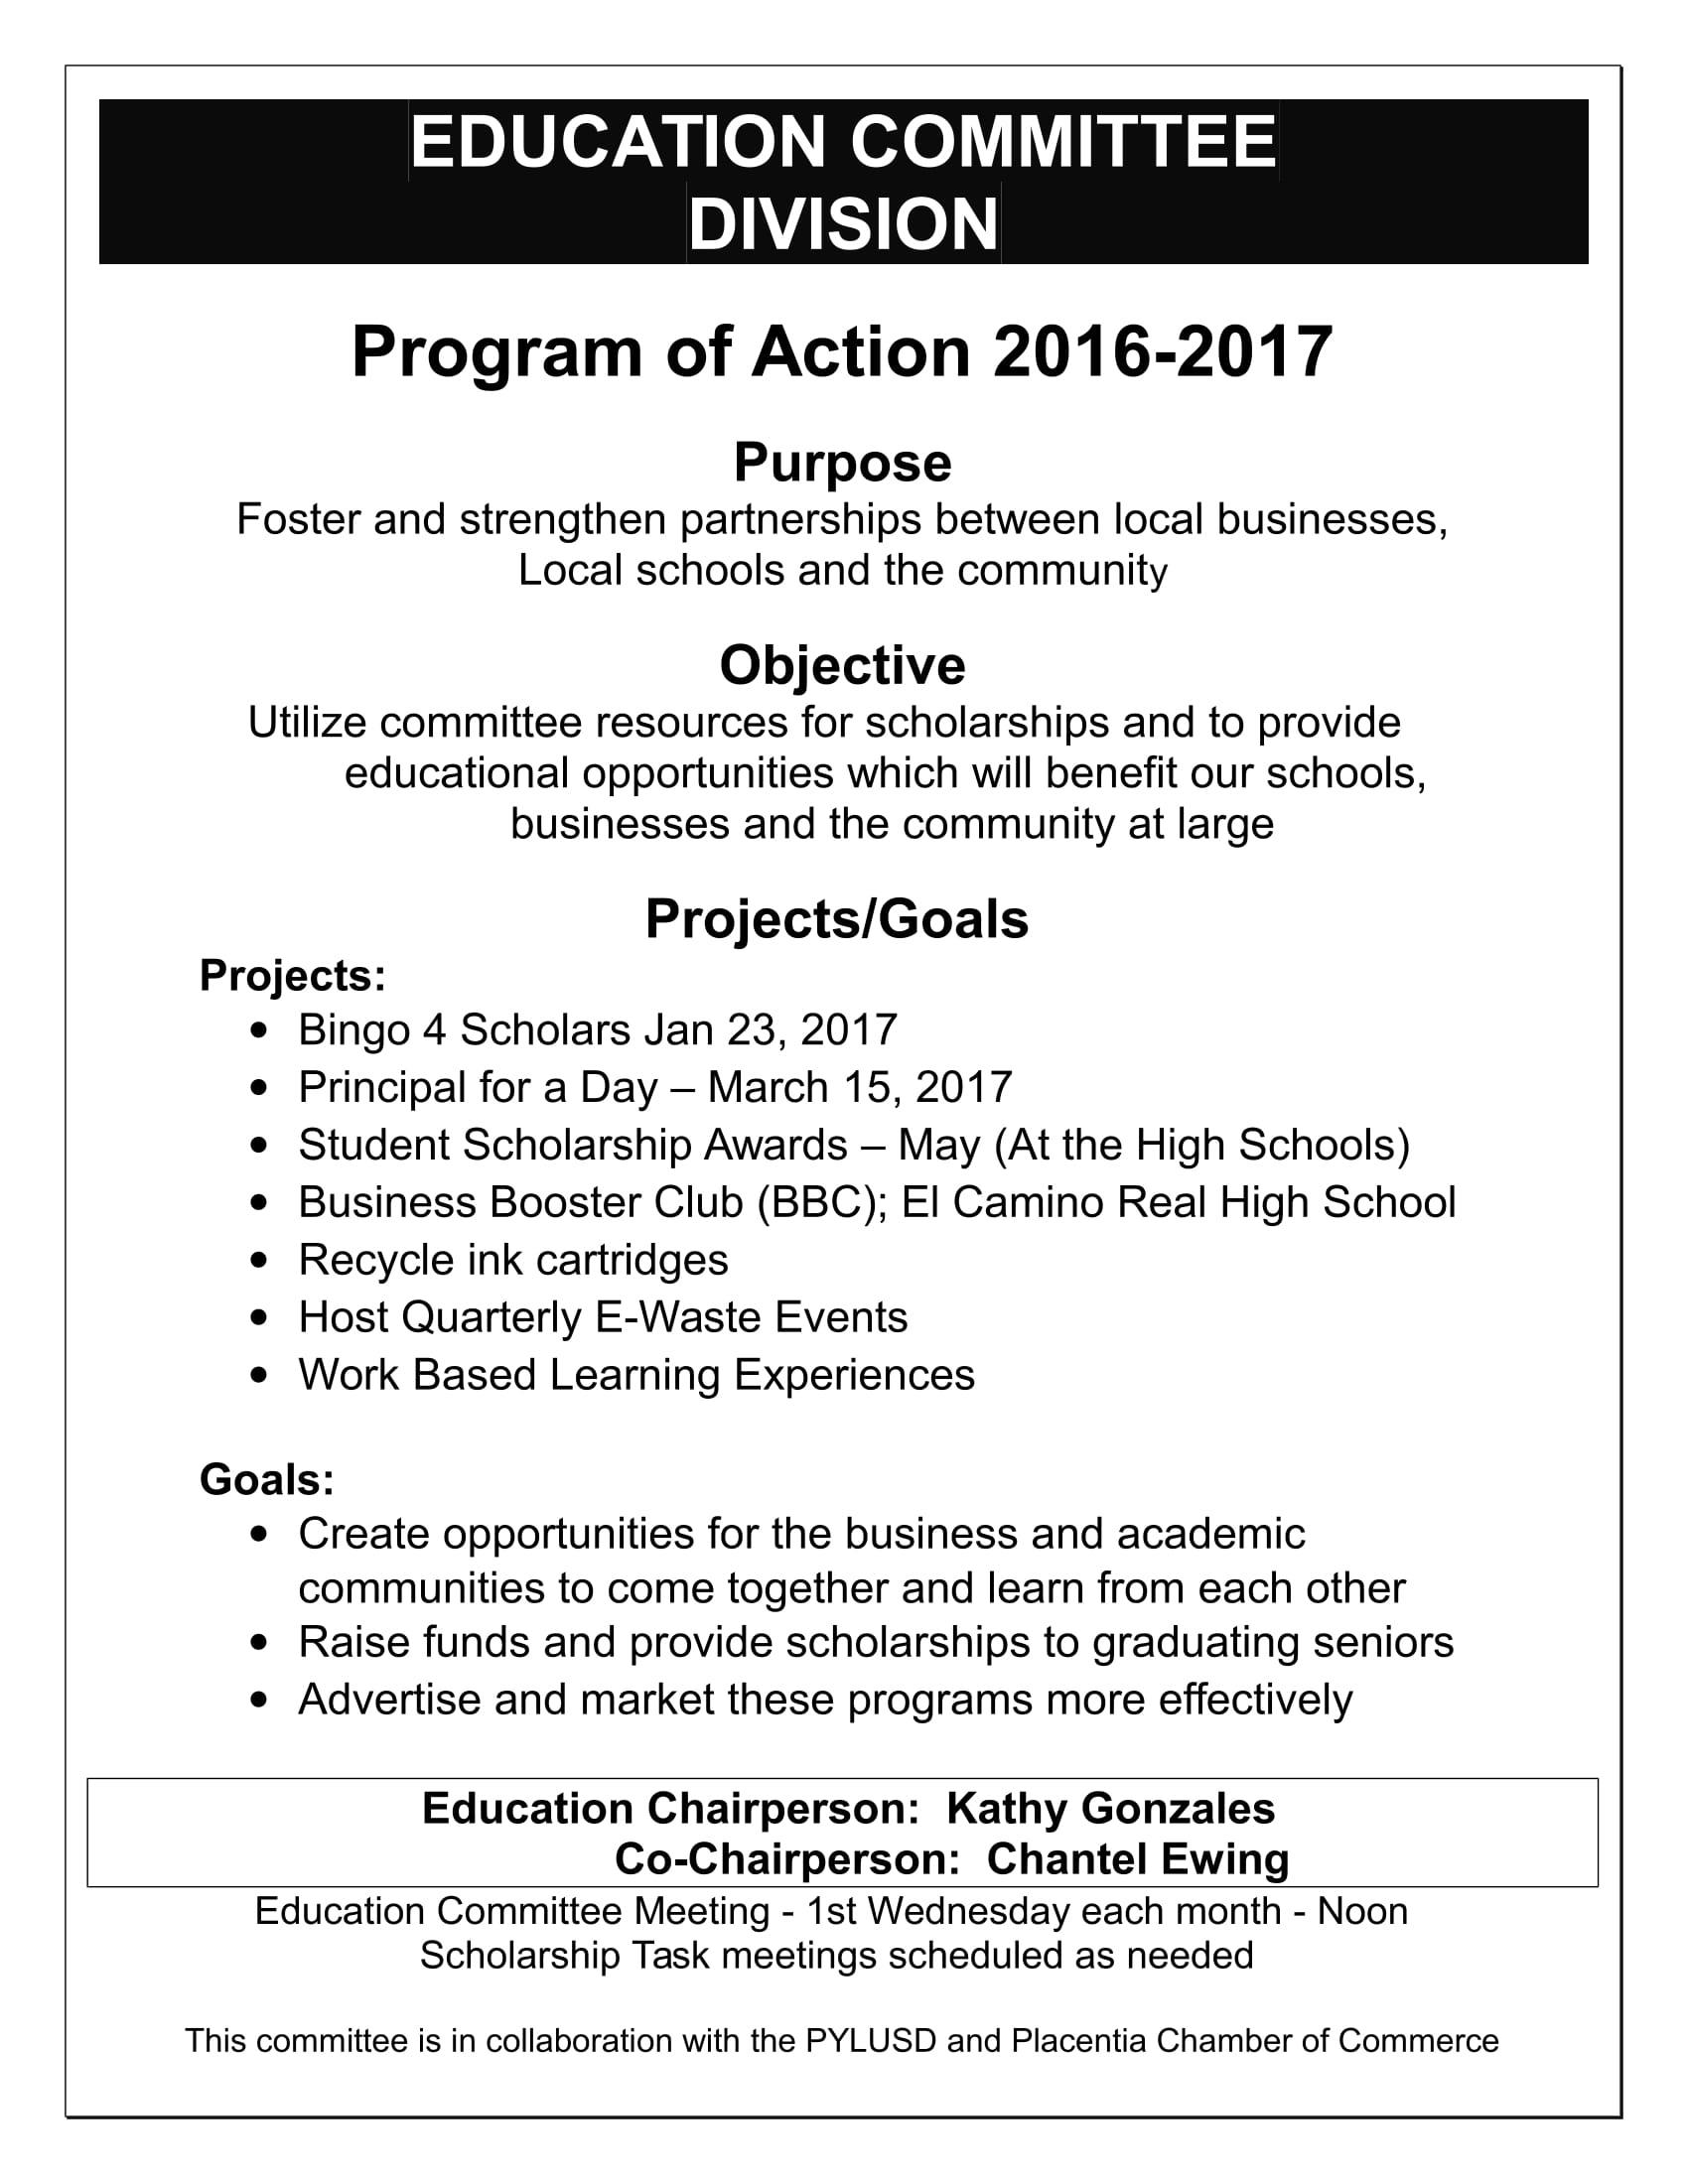 Education-Div-Action-Plan-2016-2017-1.jpg